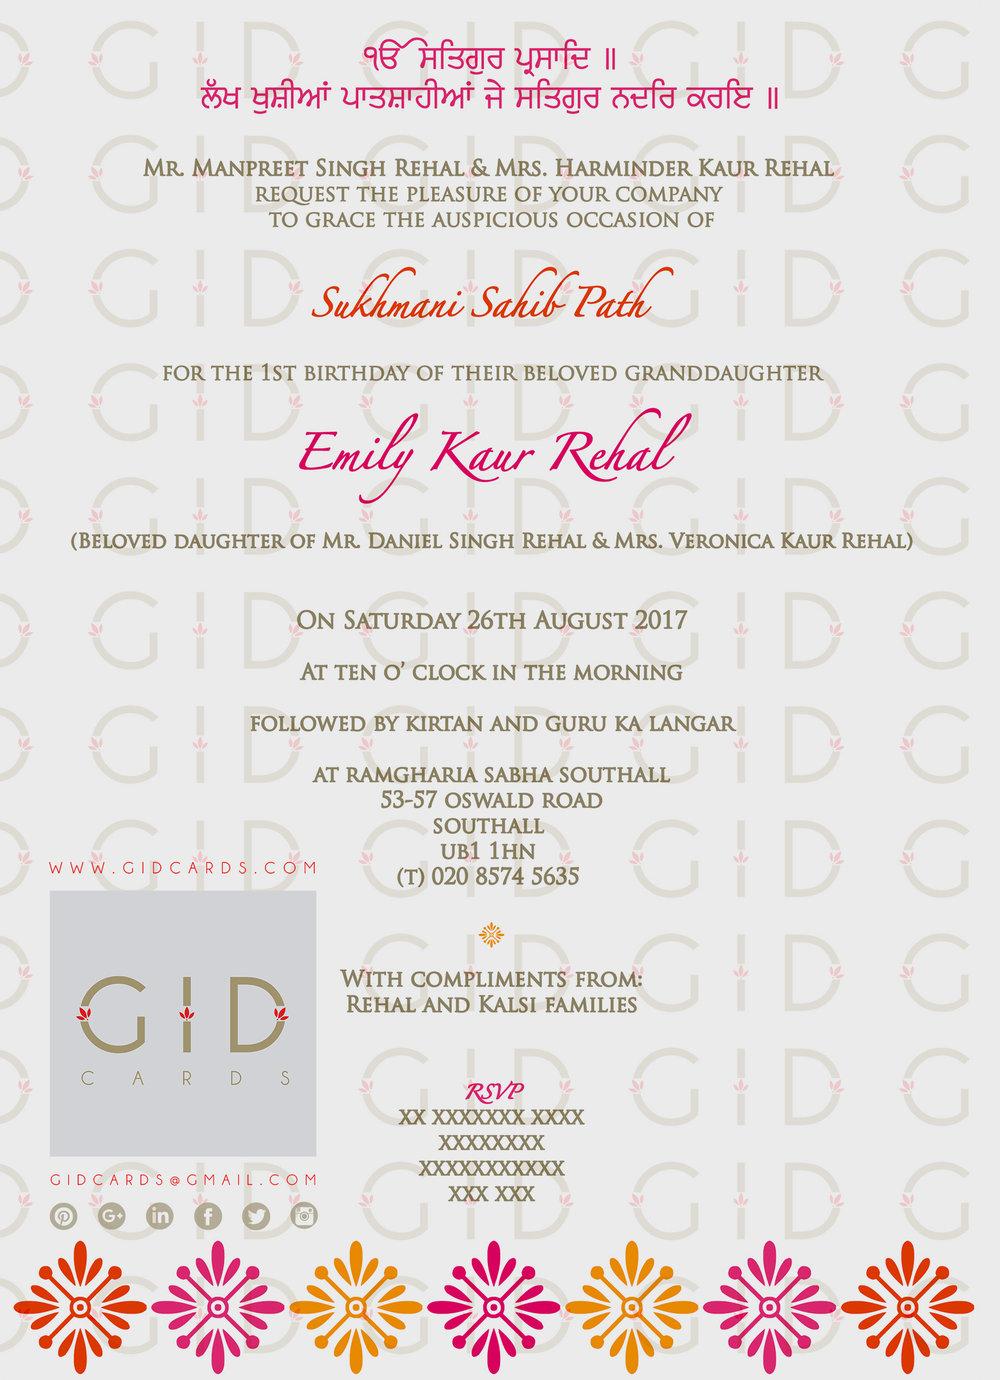 Sukhmani Sahib Path Invitation For Birthday - Best Custom Invitation Template | PS Carrillo